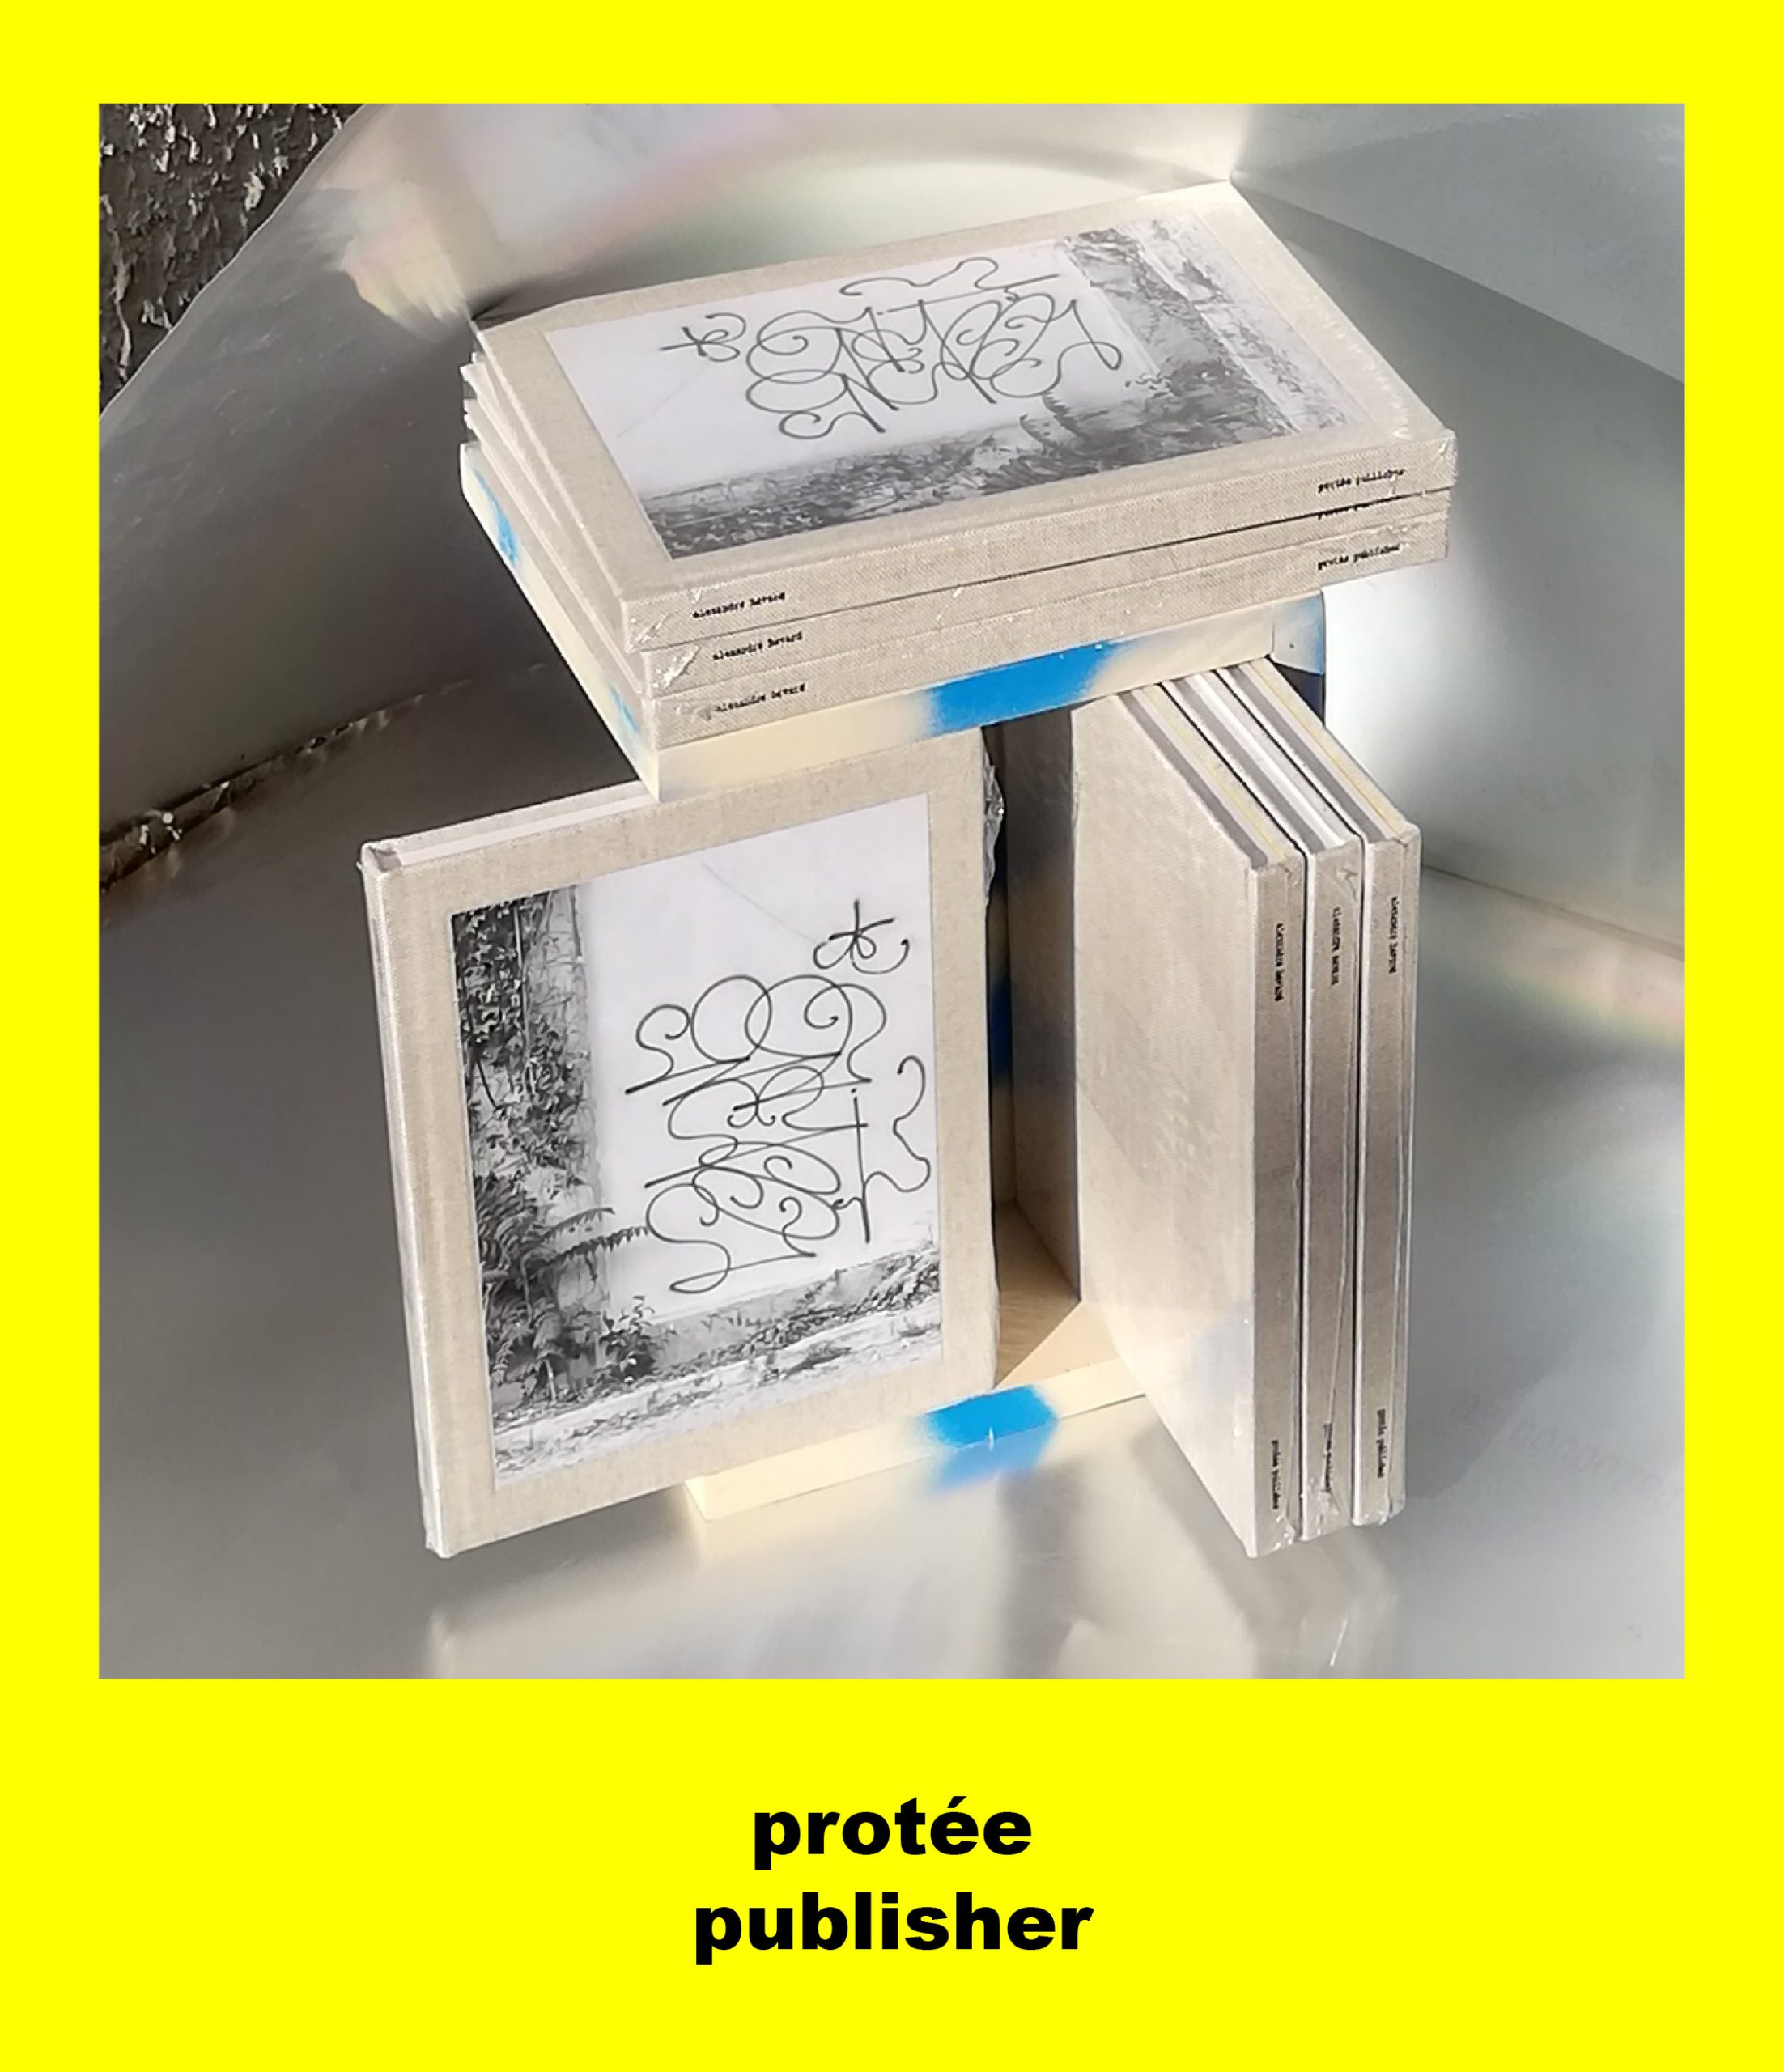 alexandre bavard card_4